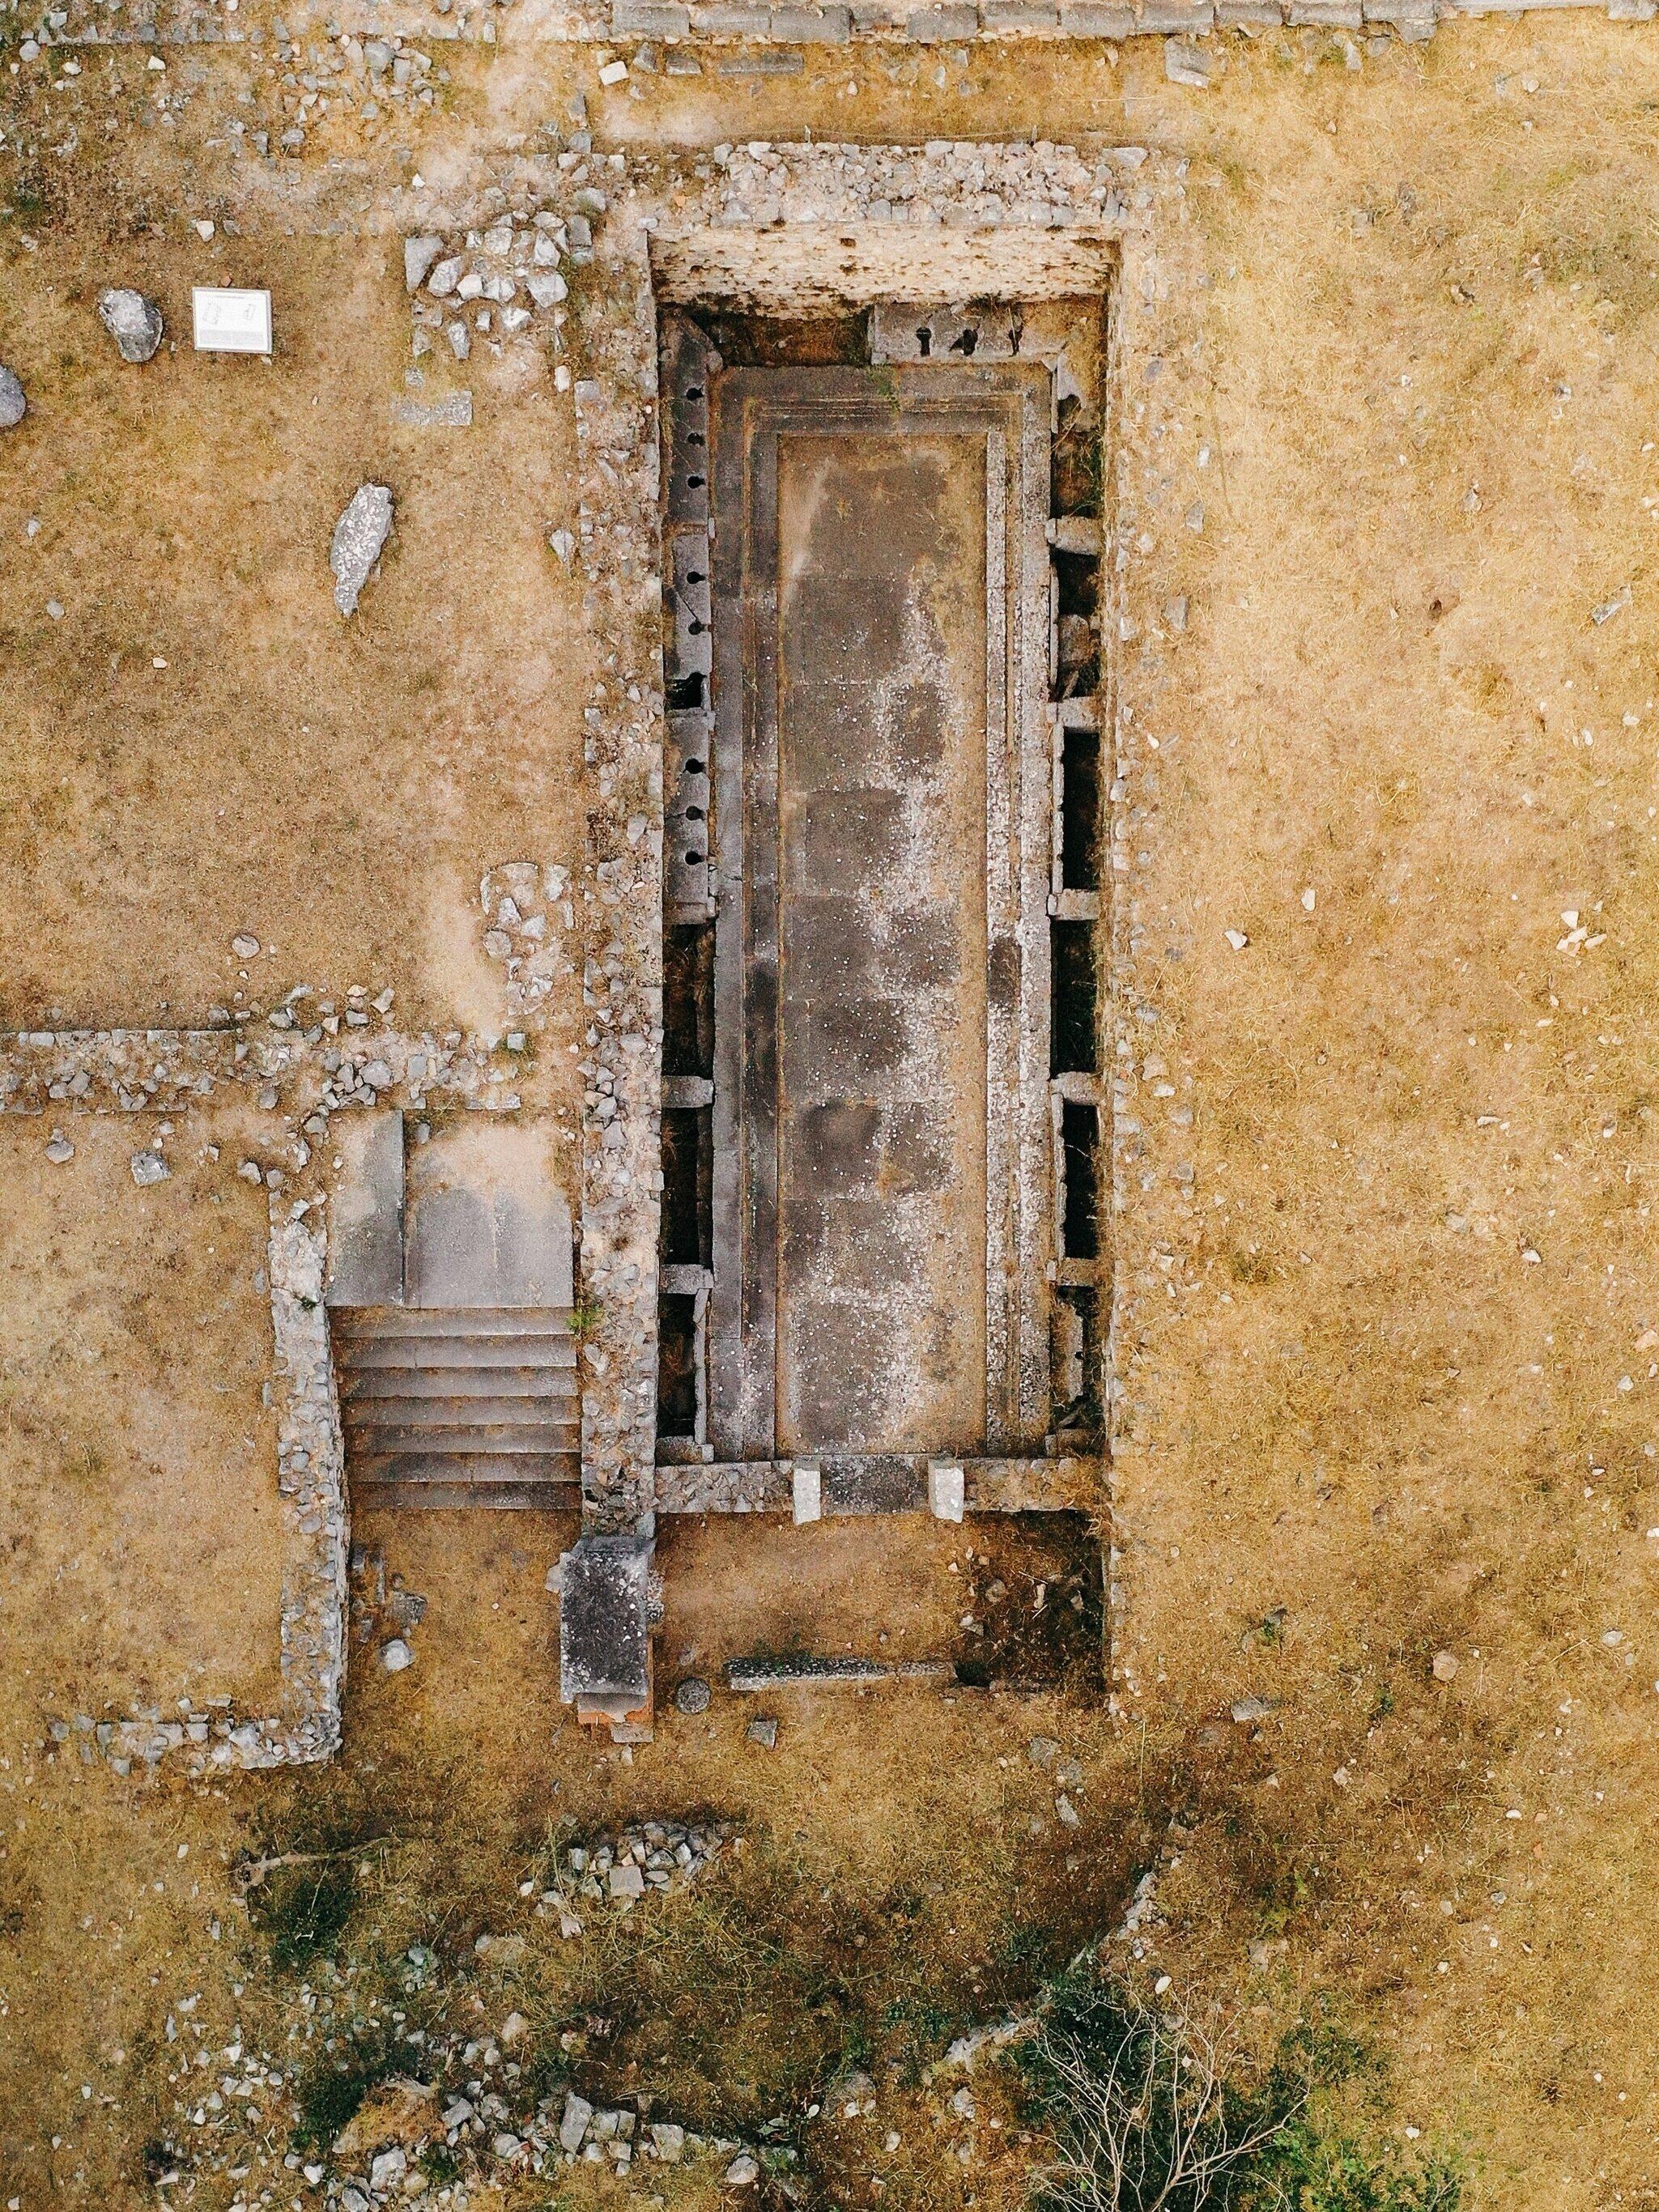 A latrine at the palaestra in Philippi